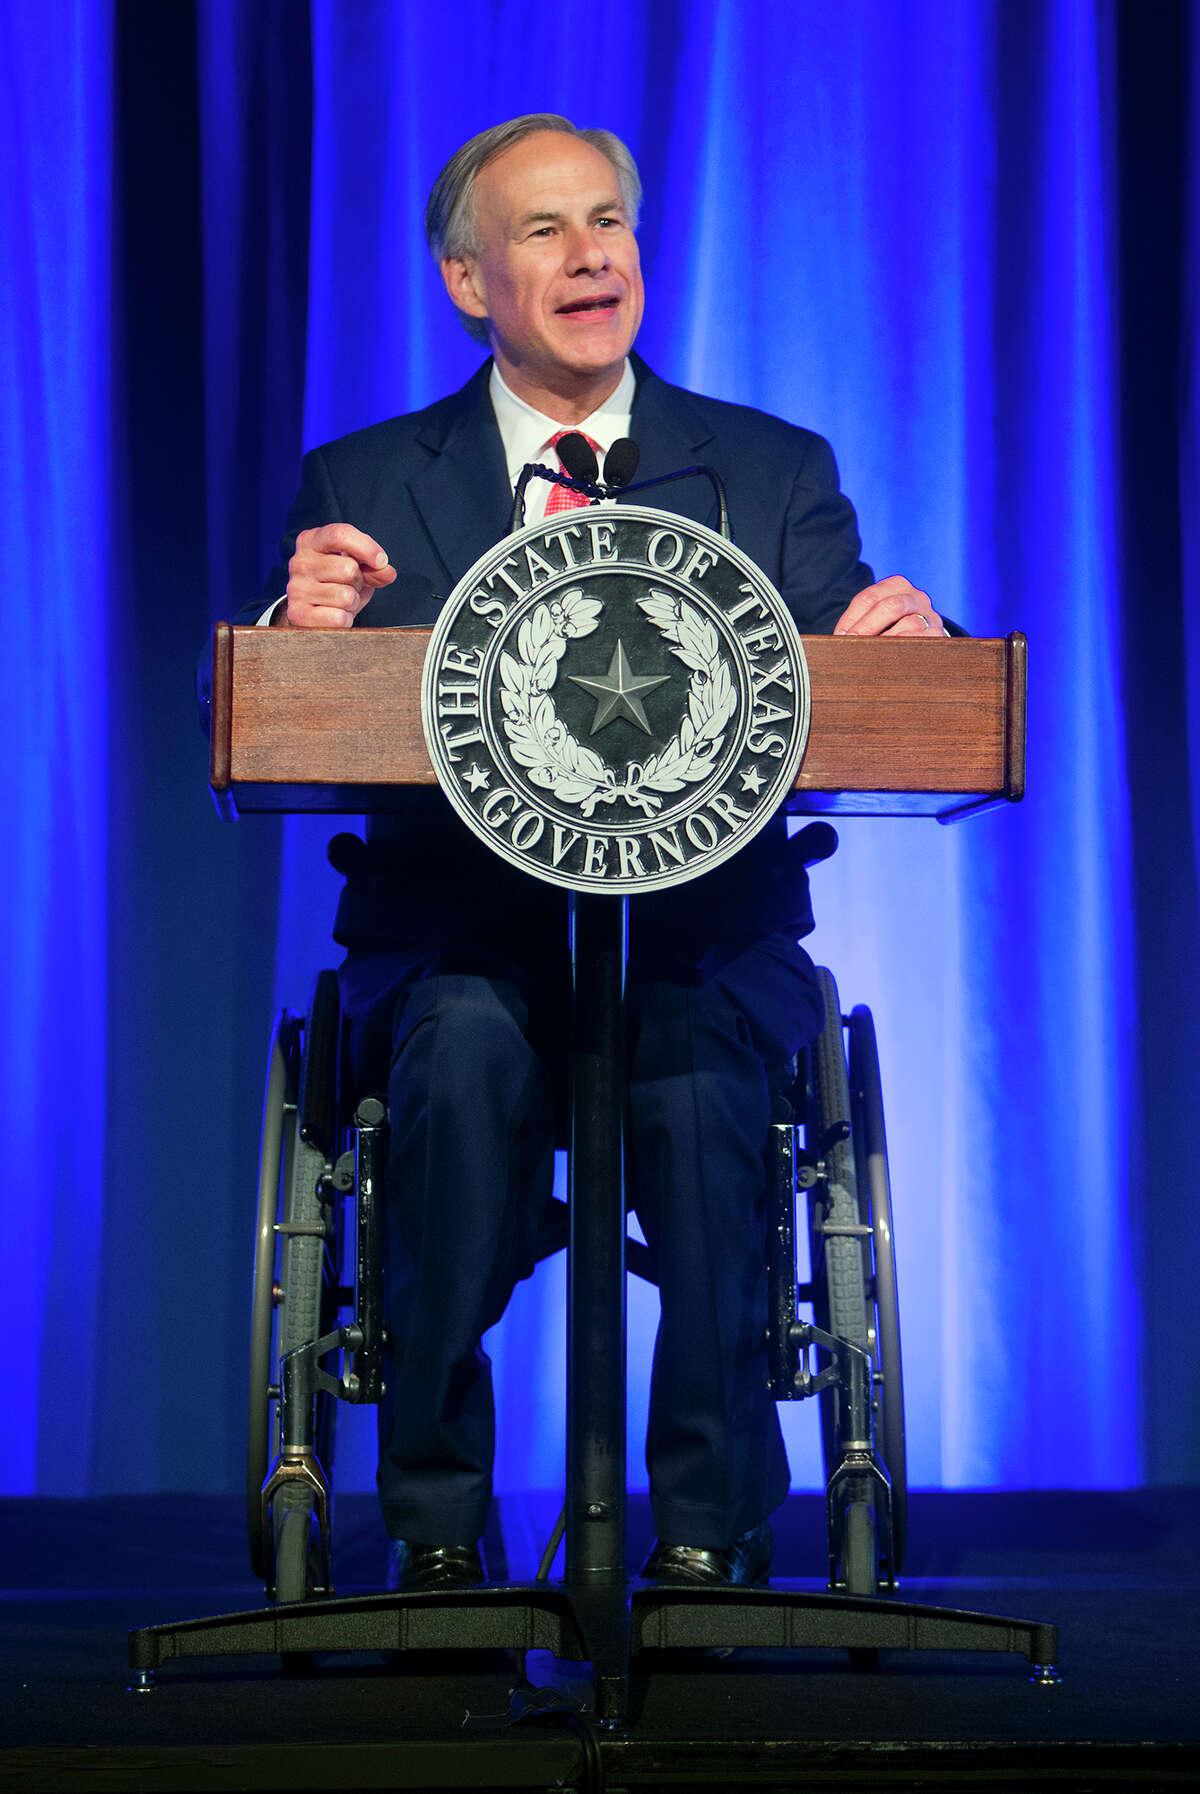 Governor Greg Abbott addresses the Houston Hispanic Chamber of Commerce at the Hilton Americas, Thursday, April 9, 2015, in Houston. (Cody Duty / Houston Chronicle)